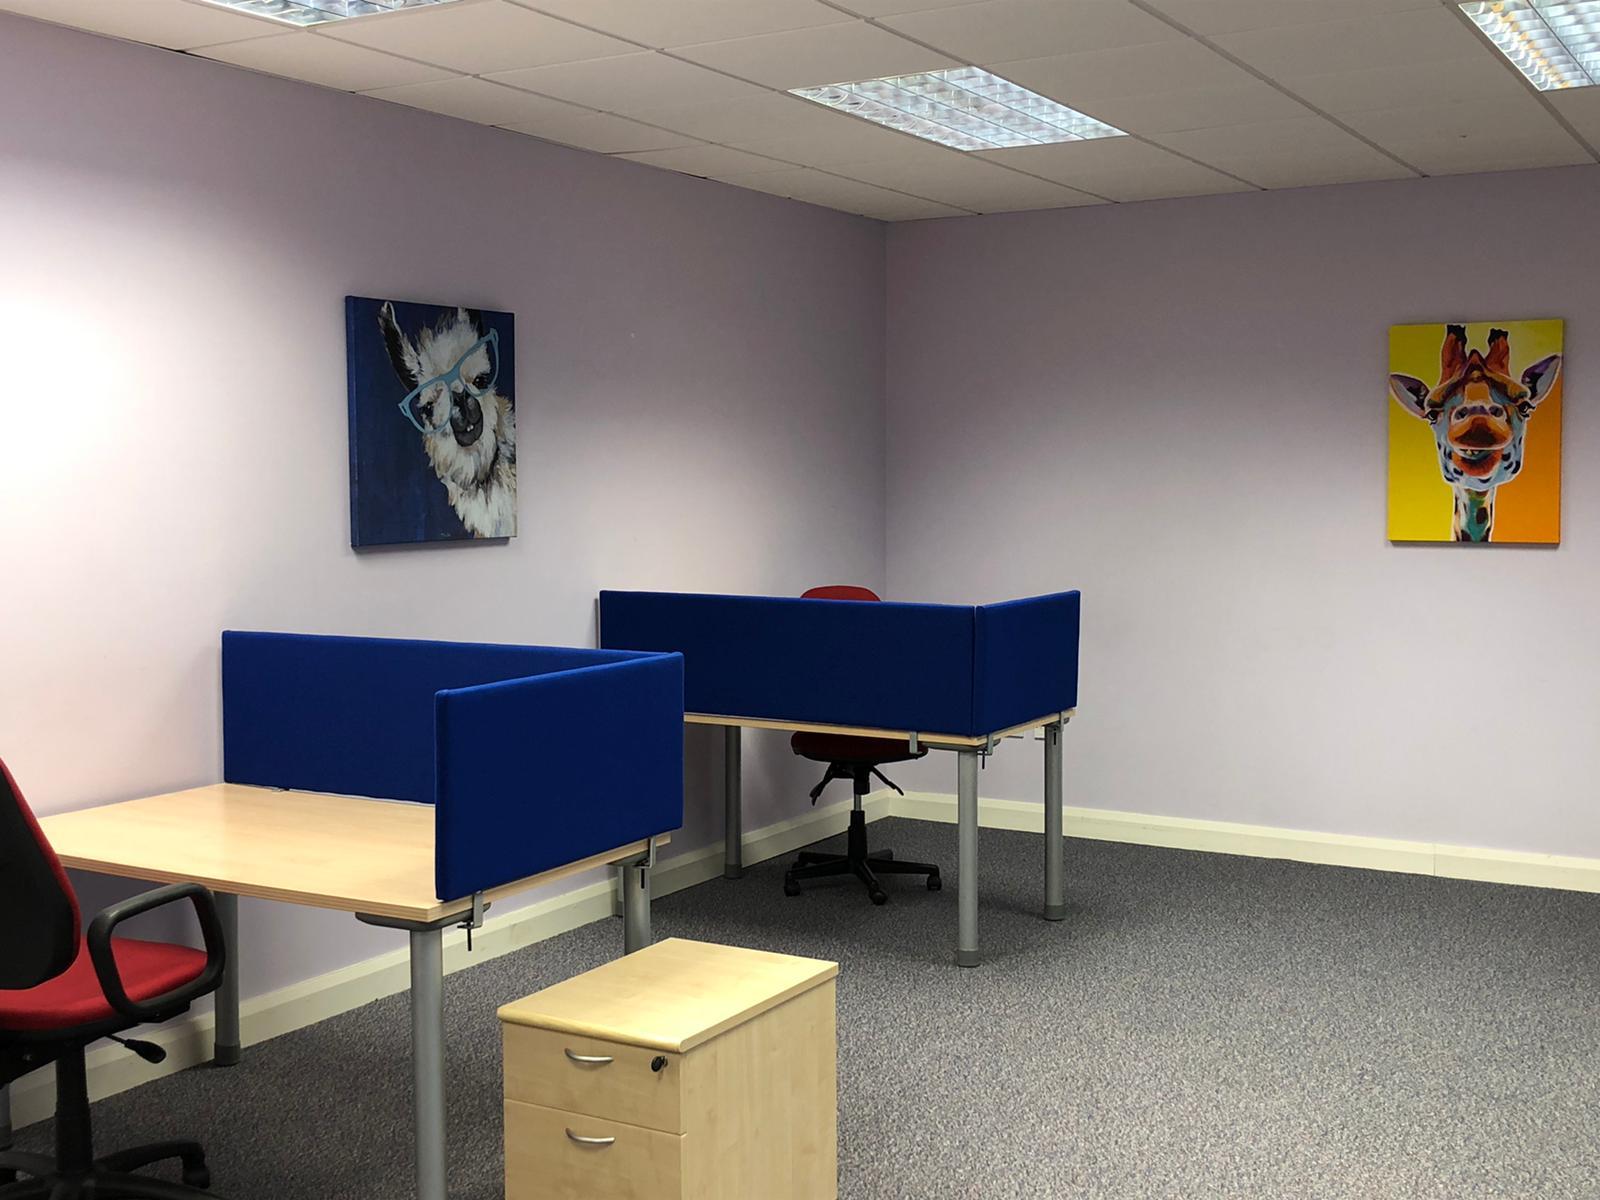 CMD Group Remote Working Hub Desks in a room